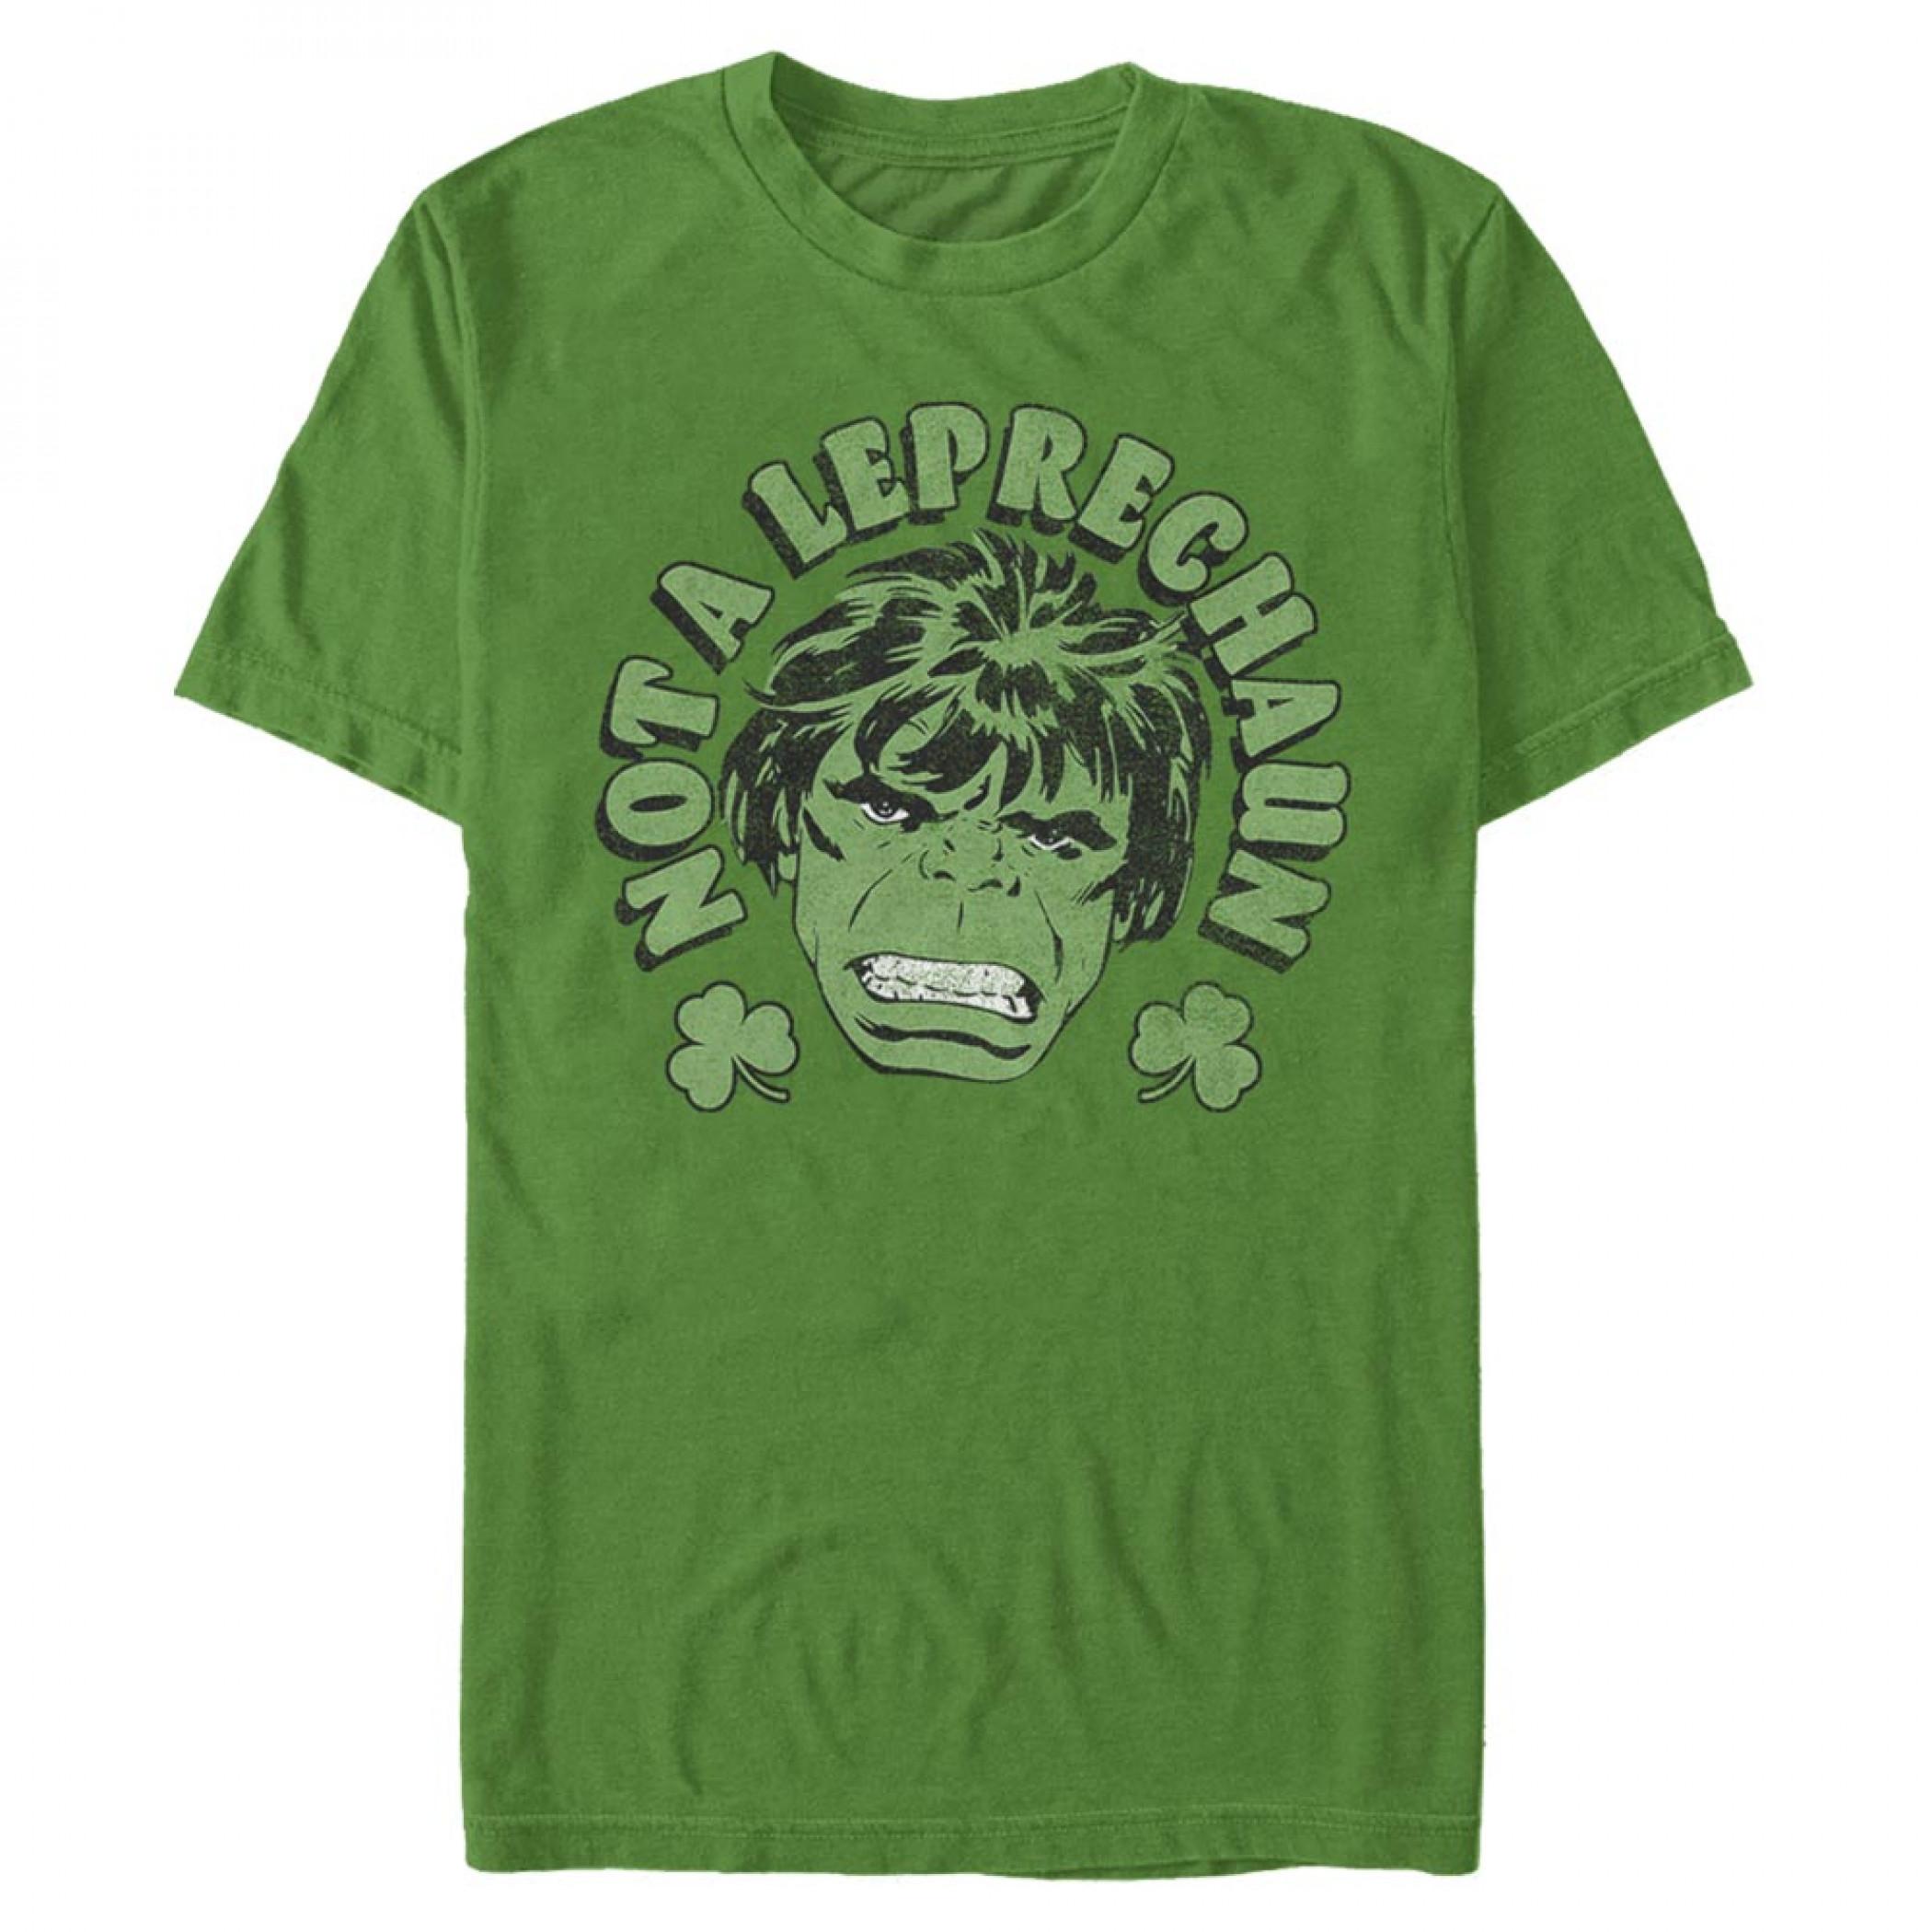 The Incredible Hulk Not A Leprechaun St. Patrick's Day T-Shirt